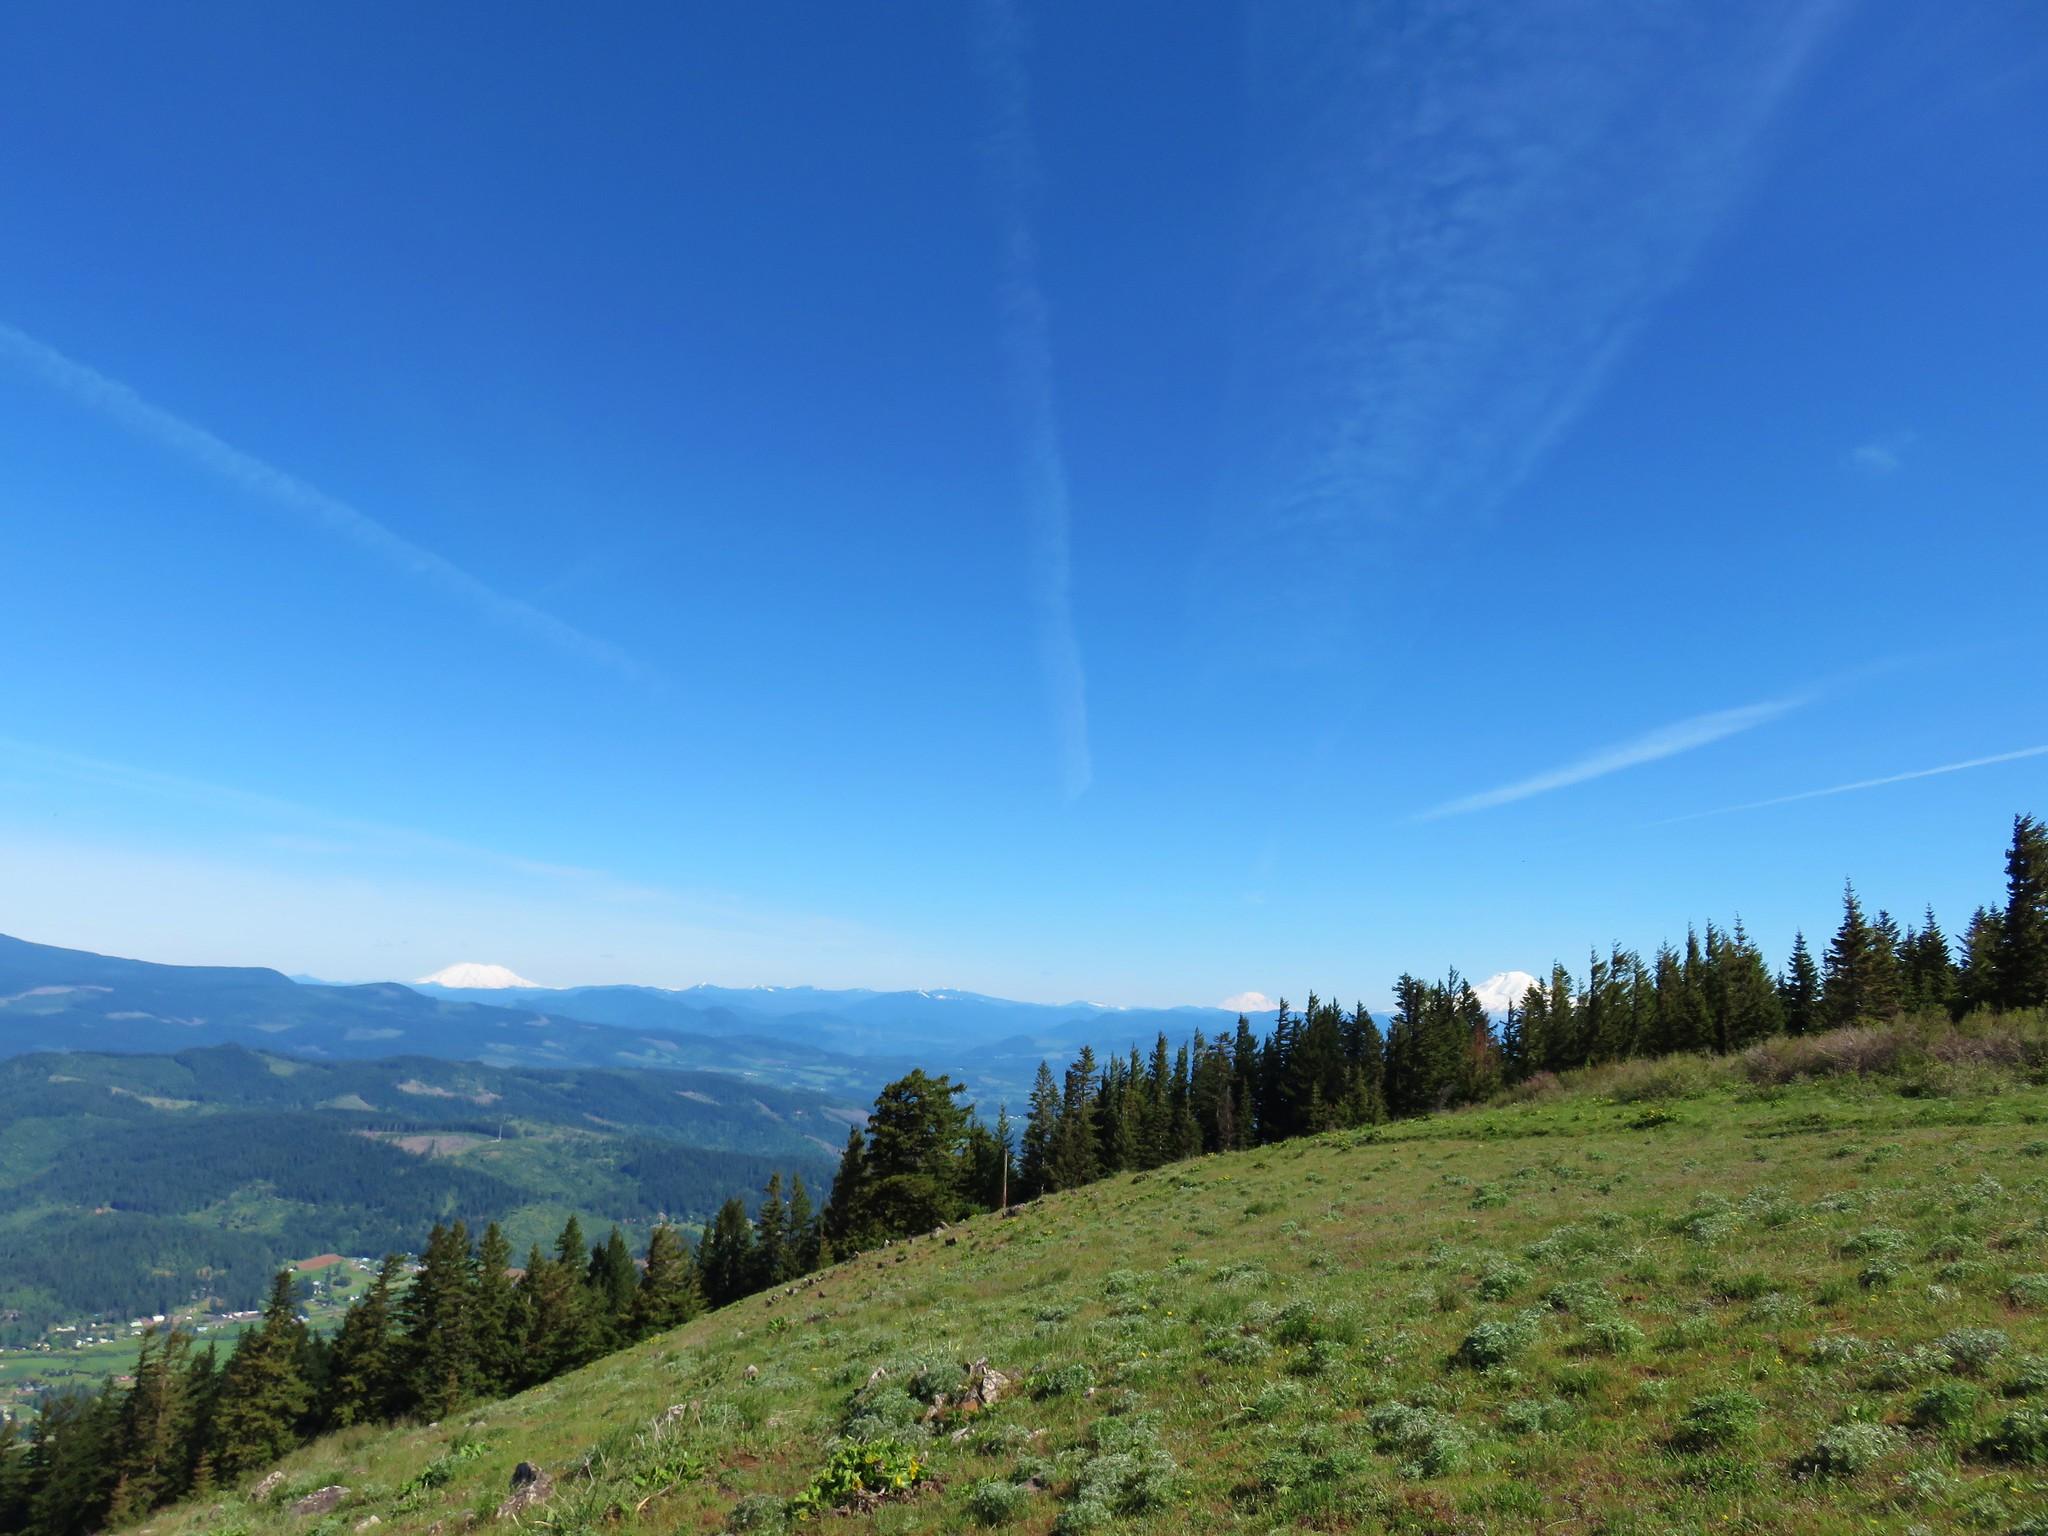 Mt. St. Helens, Mt. Rainier, and Mt. Adams